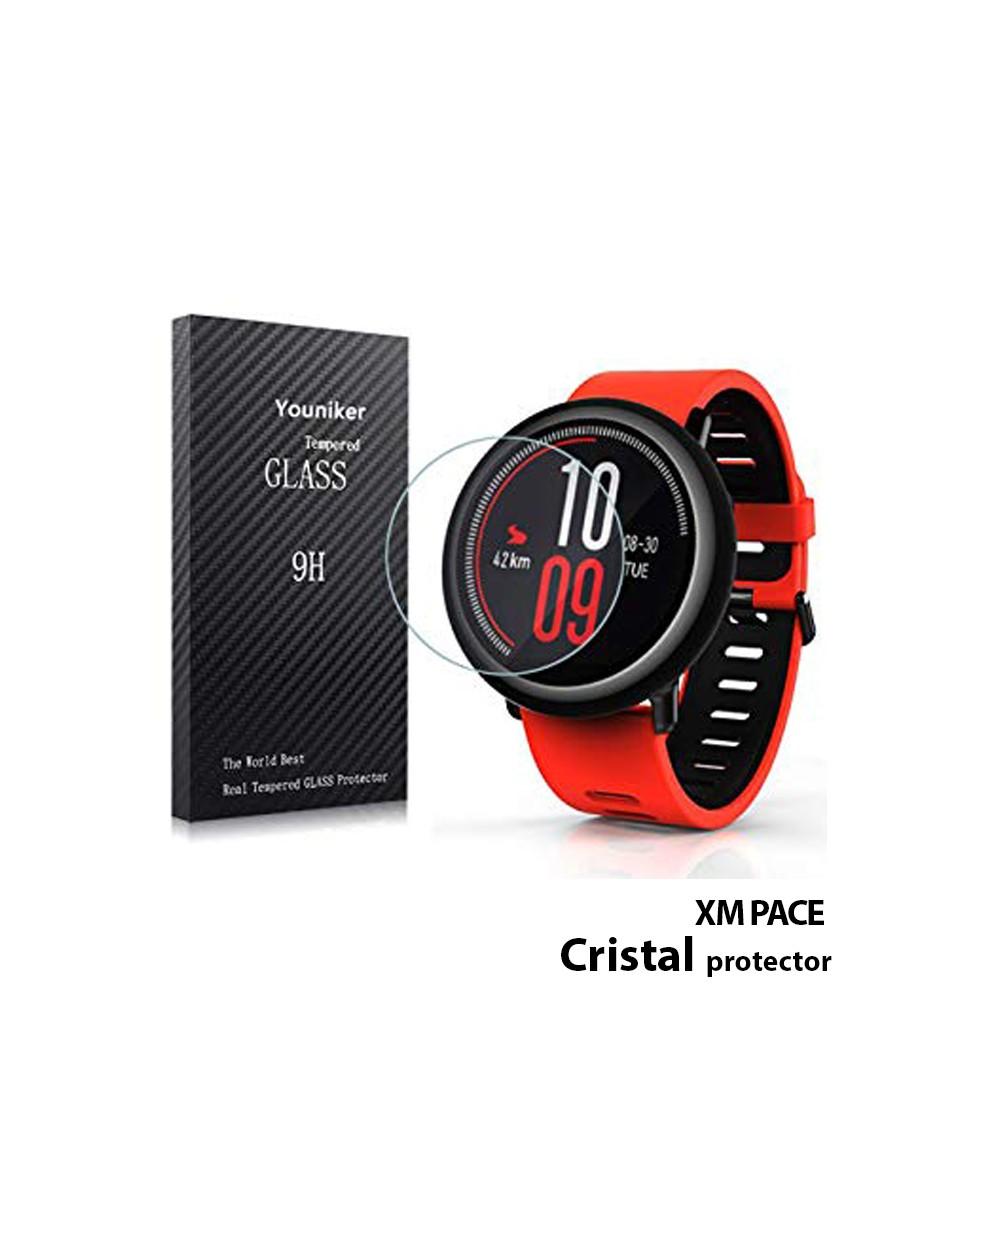 Cristal Protector para reloj Xiaomi Pace